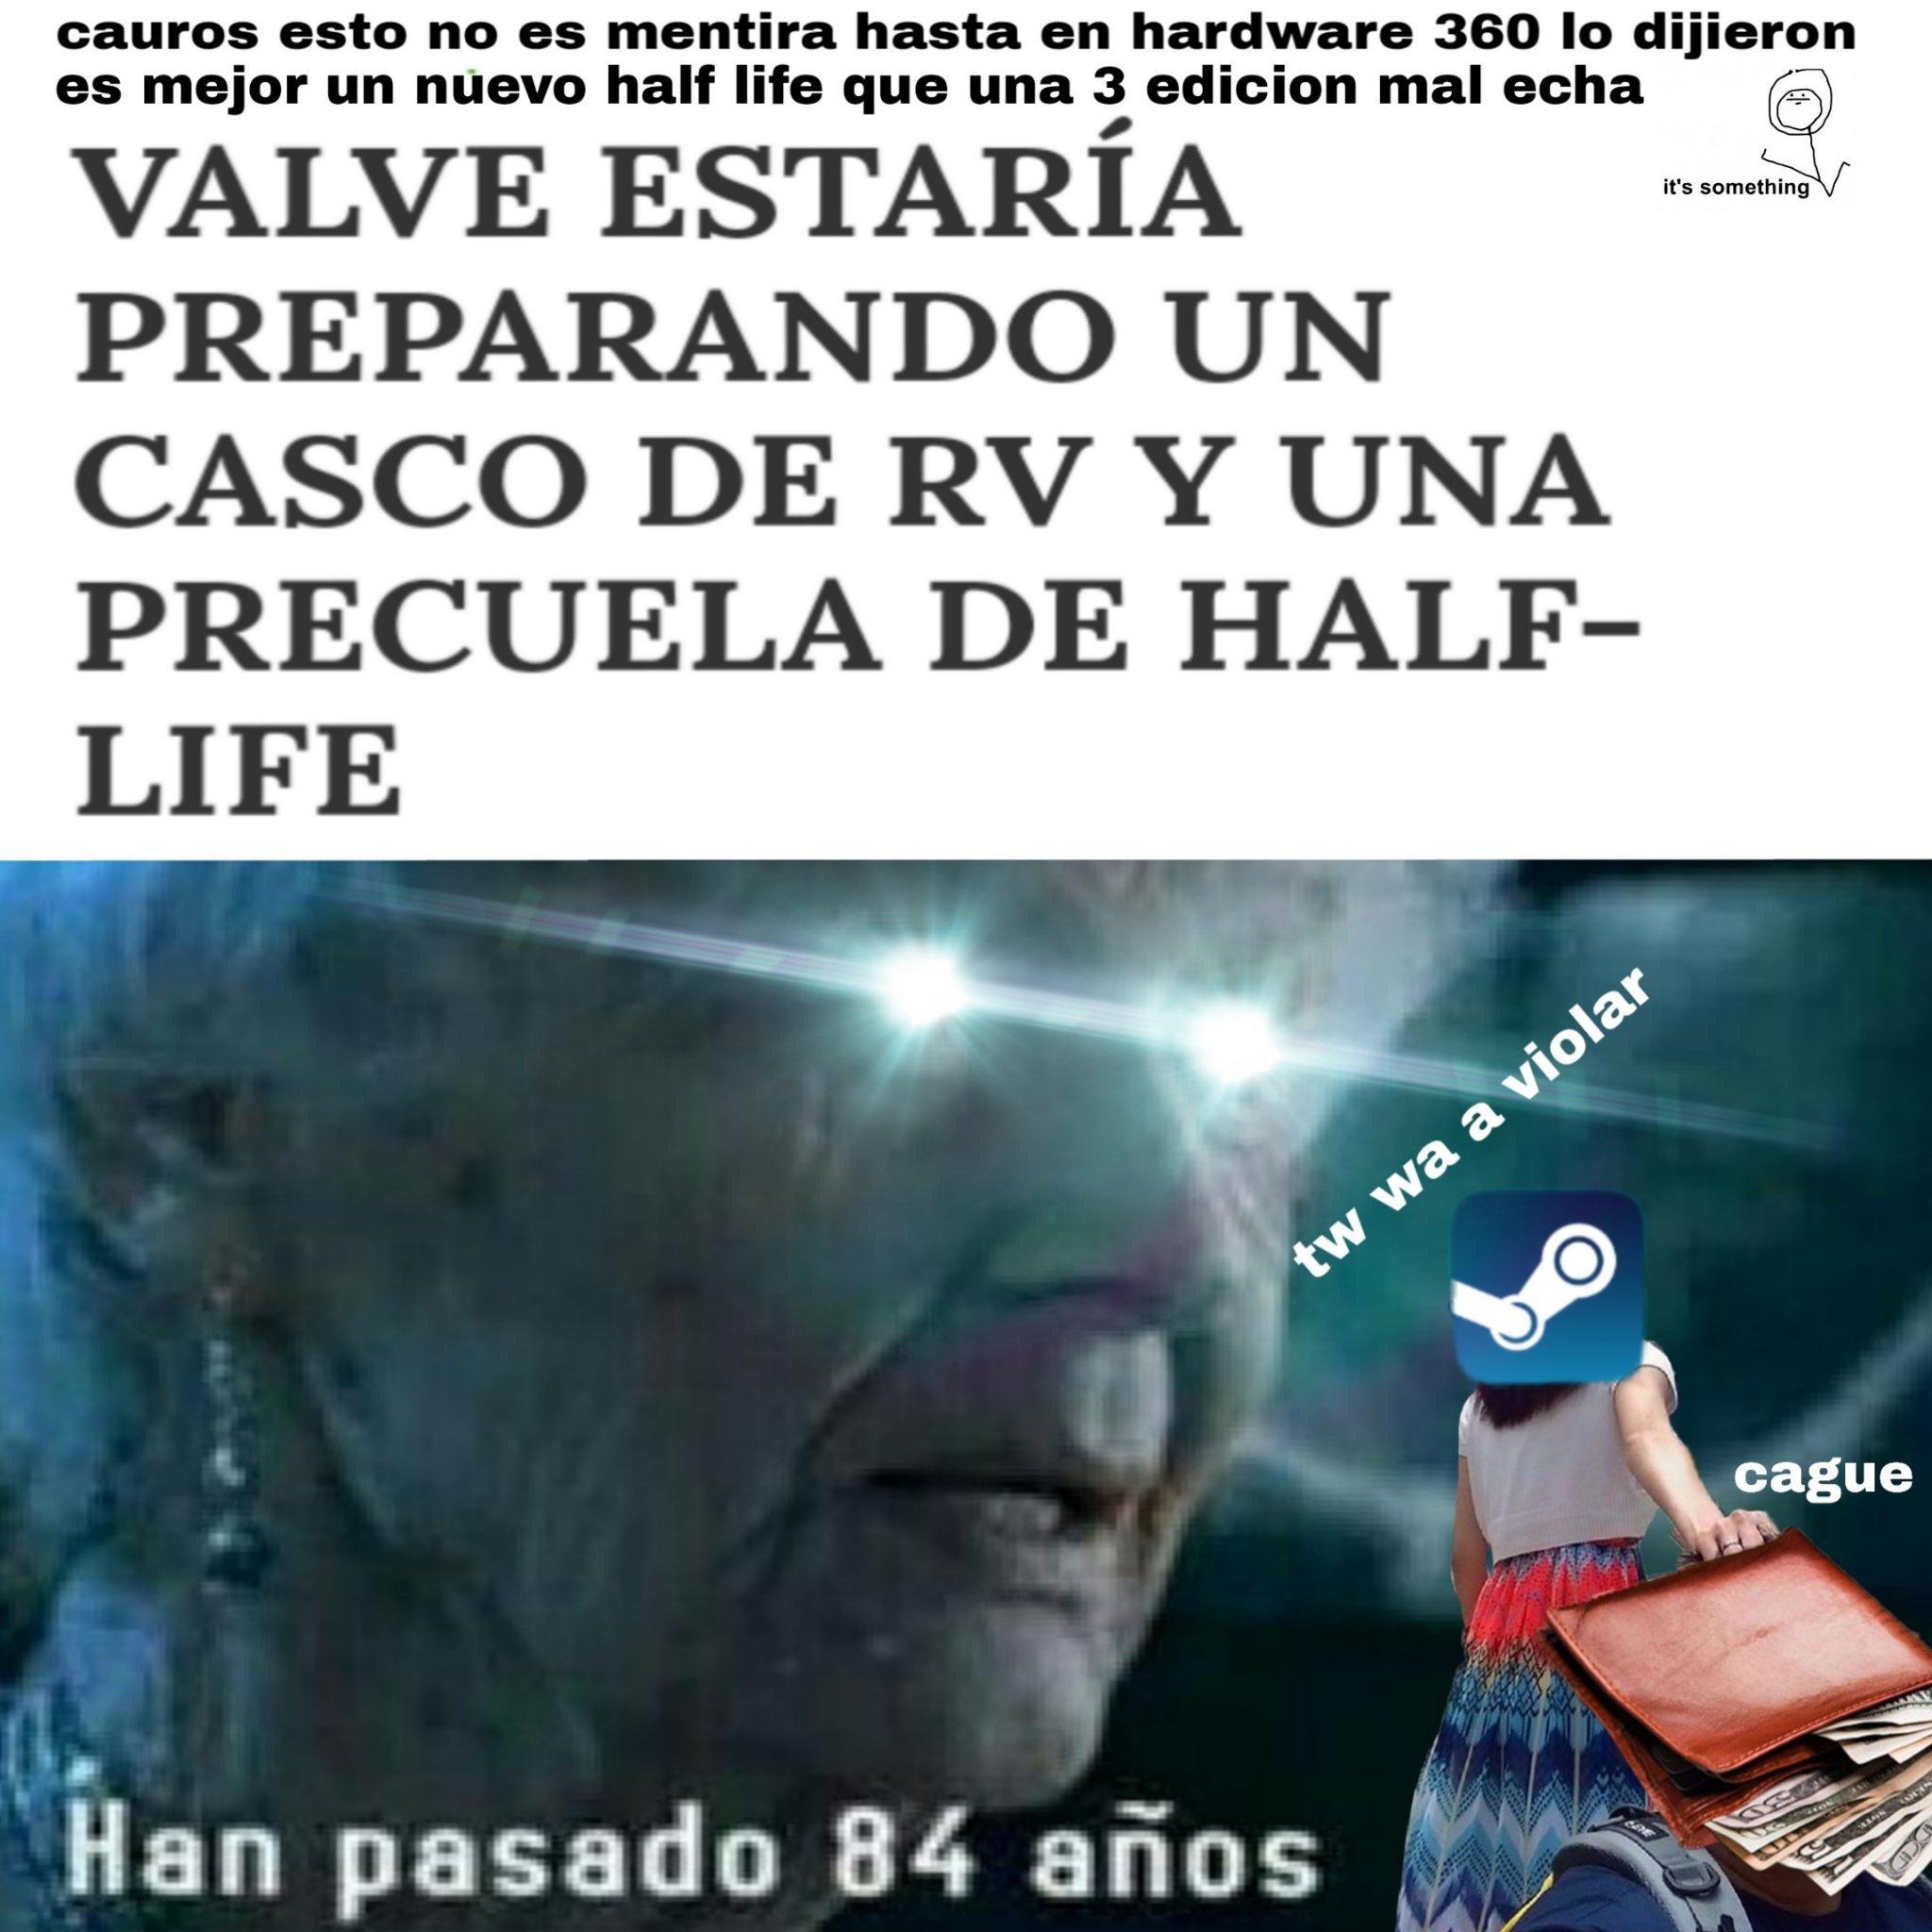 HALF LIFE?! *le explota la felicidad* - meme